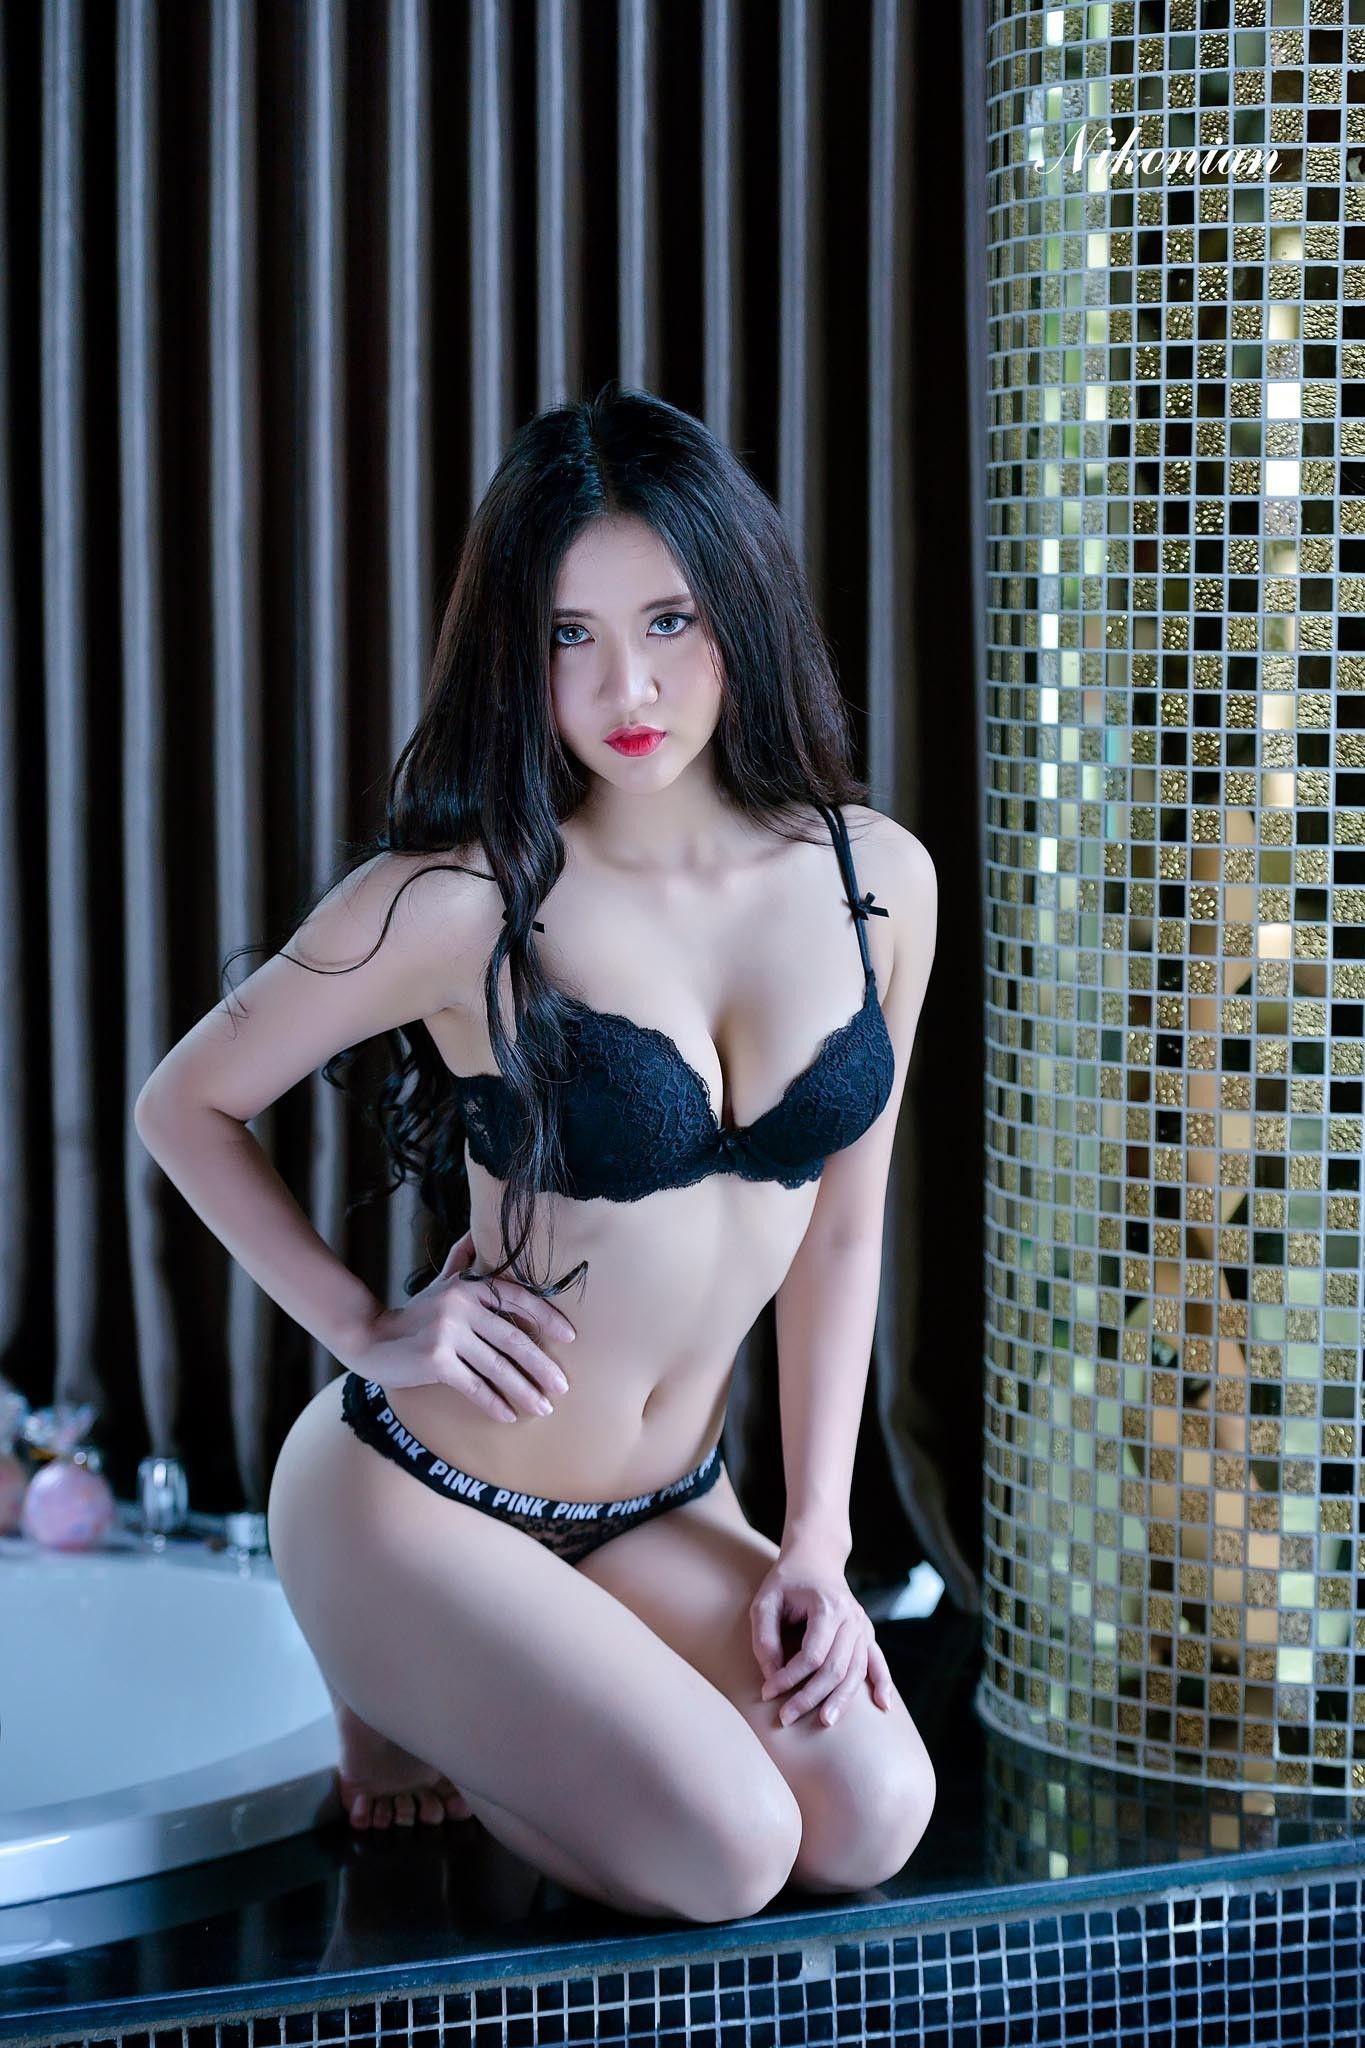 Nude art asia: Vintage Fashion in Asian Woman Magazine